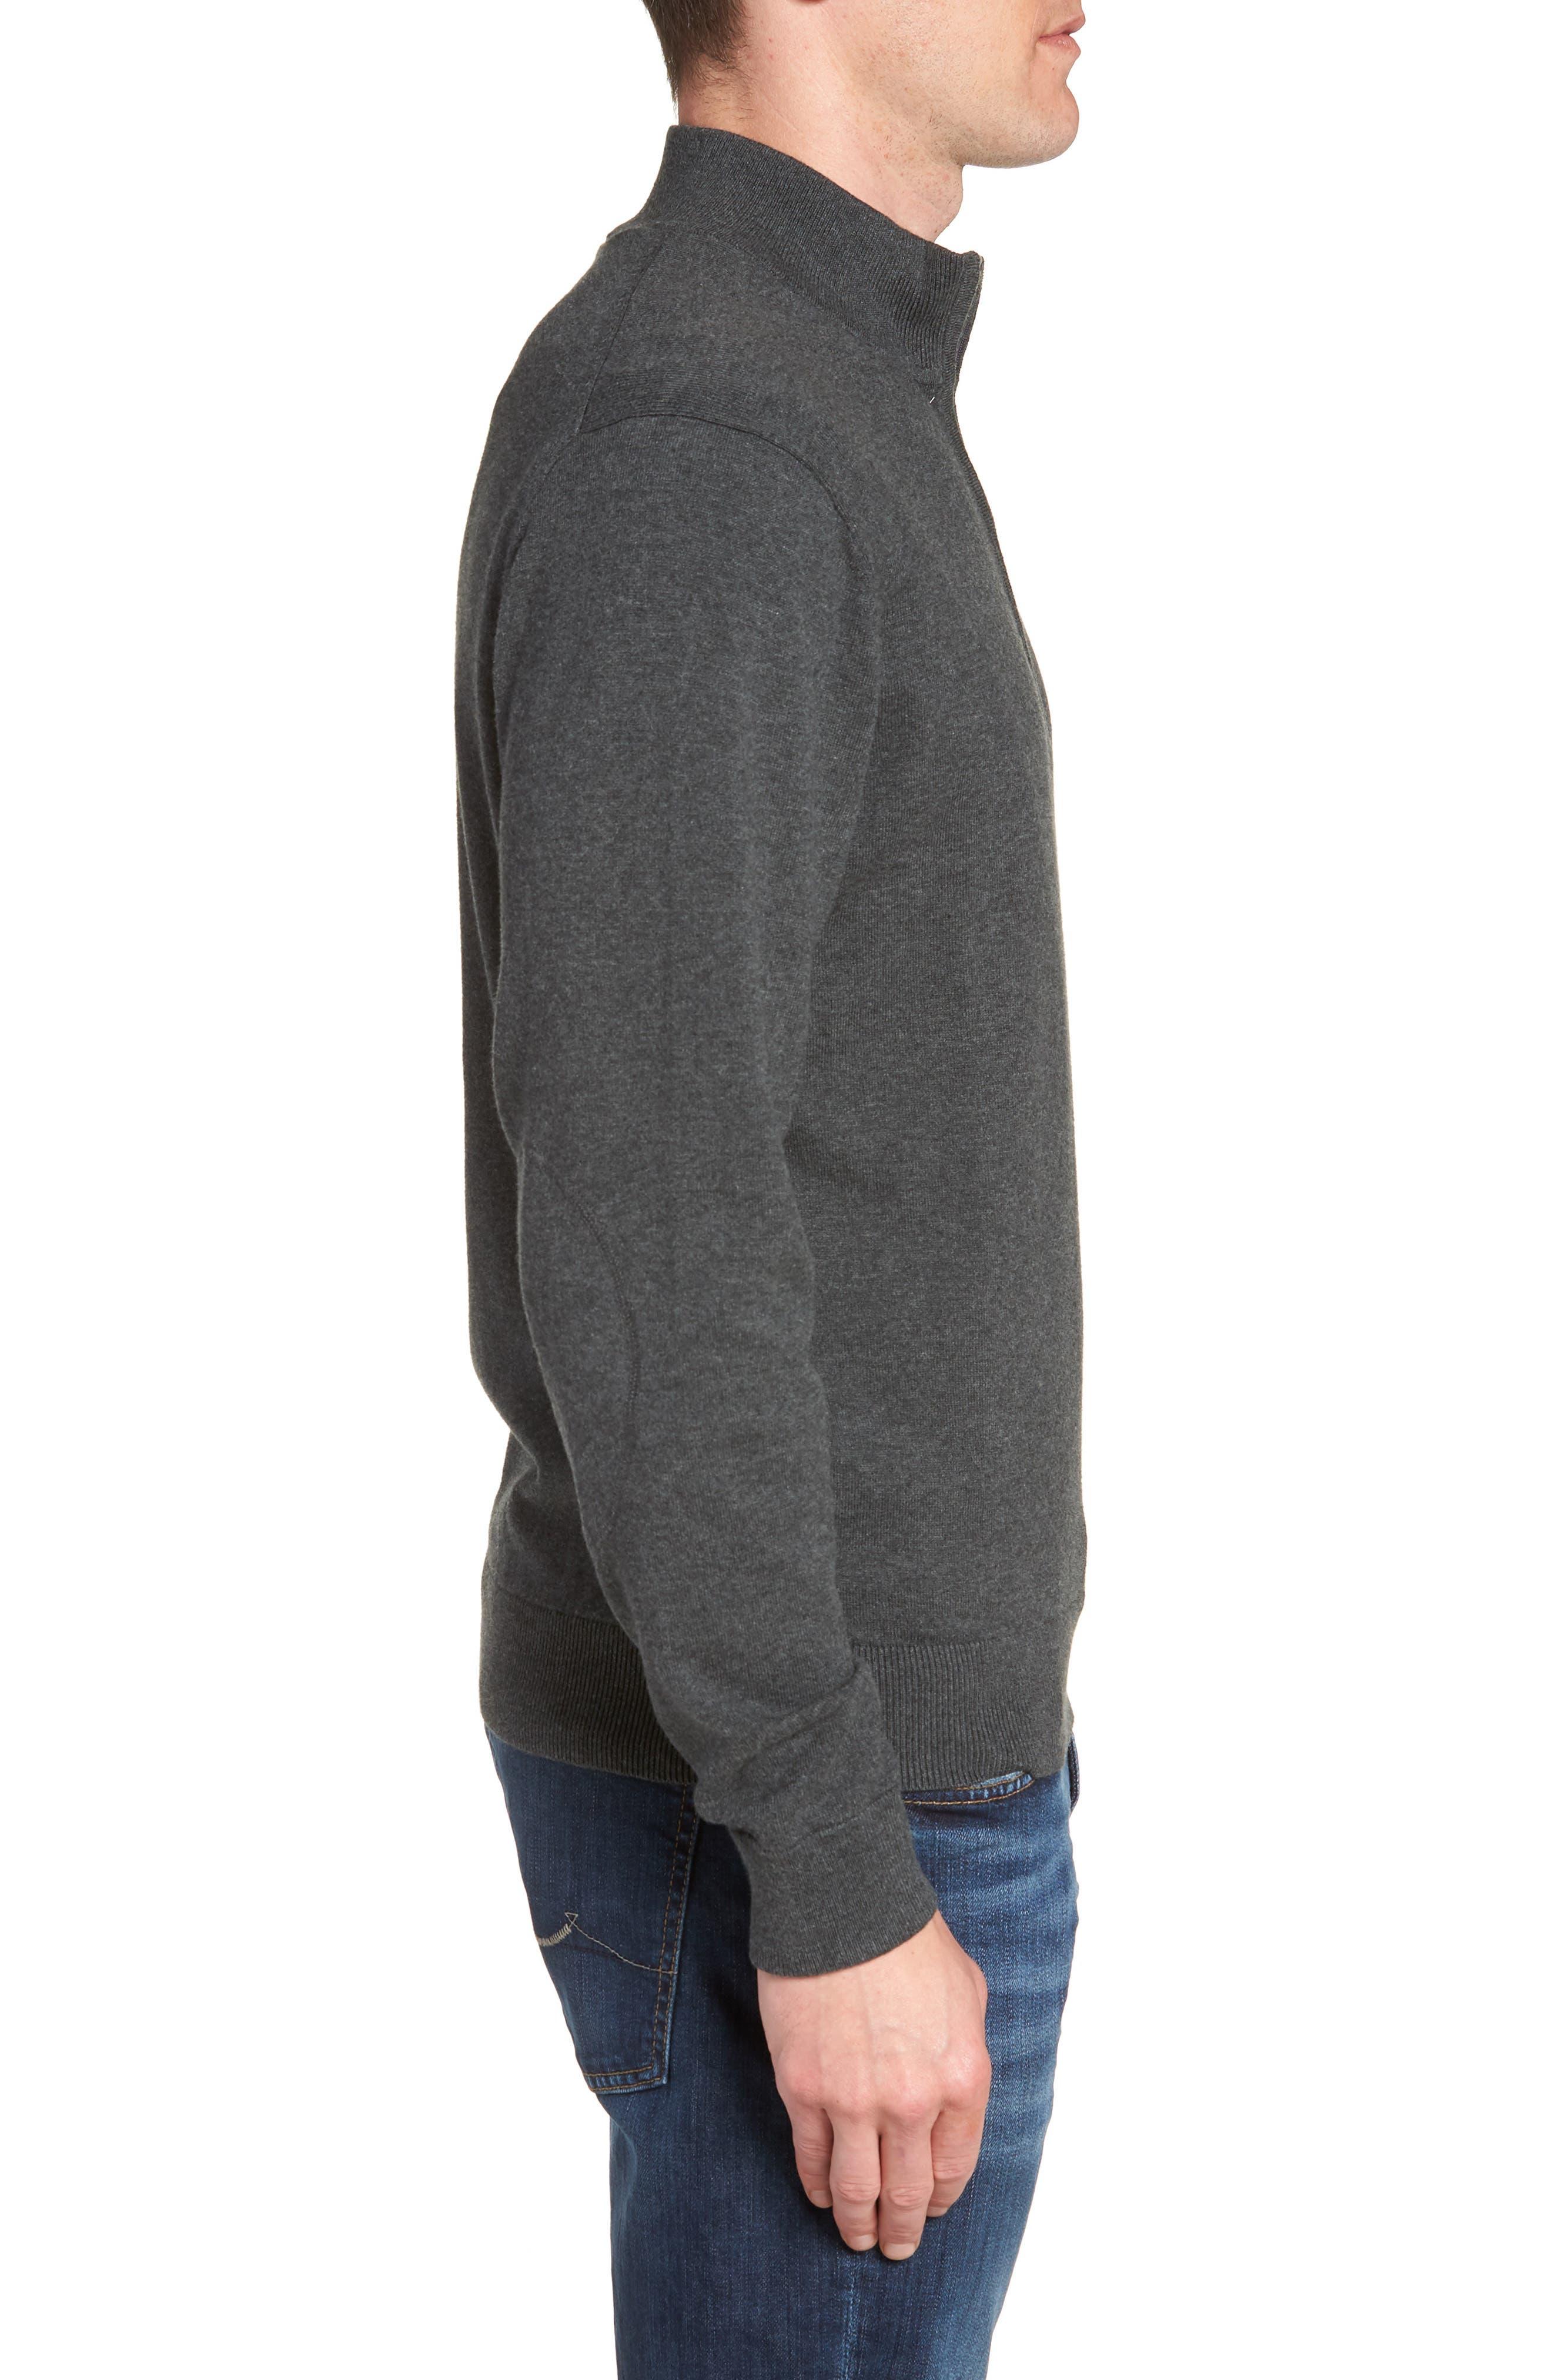 Houston Texans - Lakemont Regular Fit Quarter Zip Sweater,                             Alternate thumbnail 3, color,                             CHARCOAL HEATHER